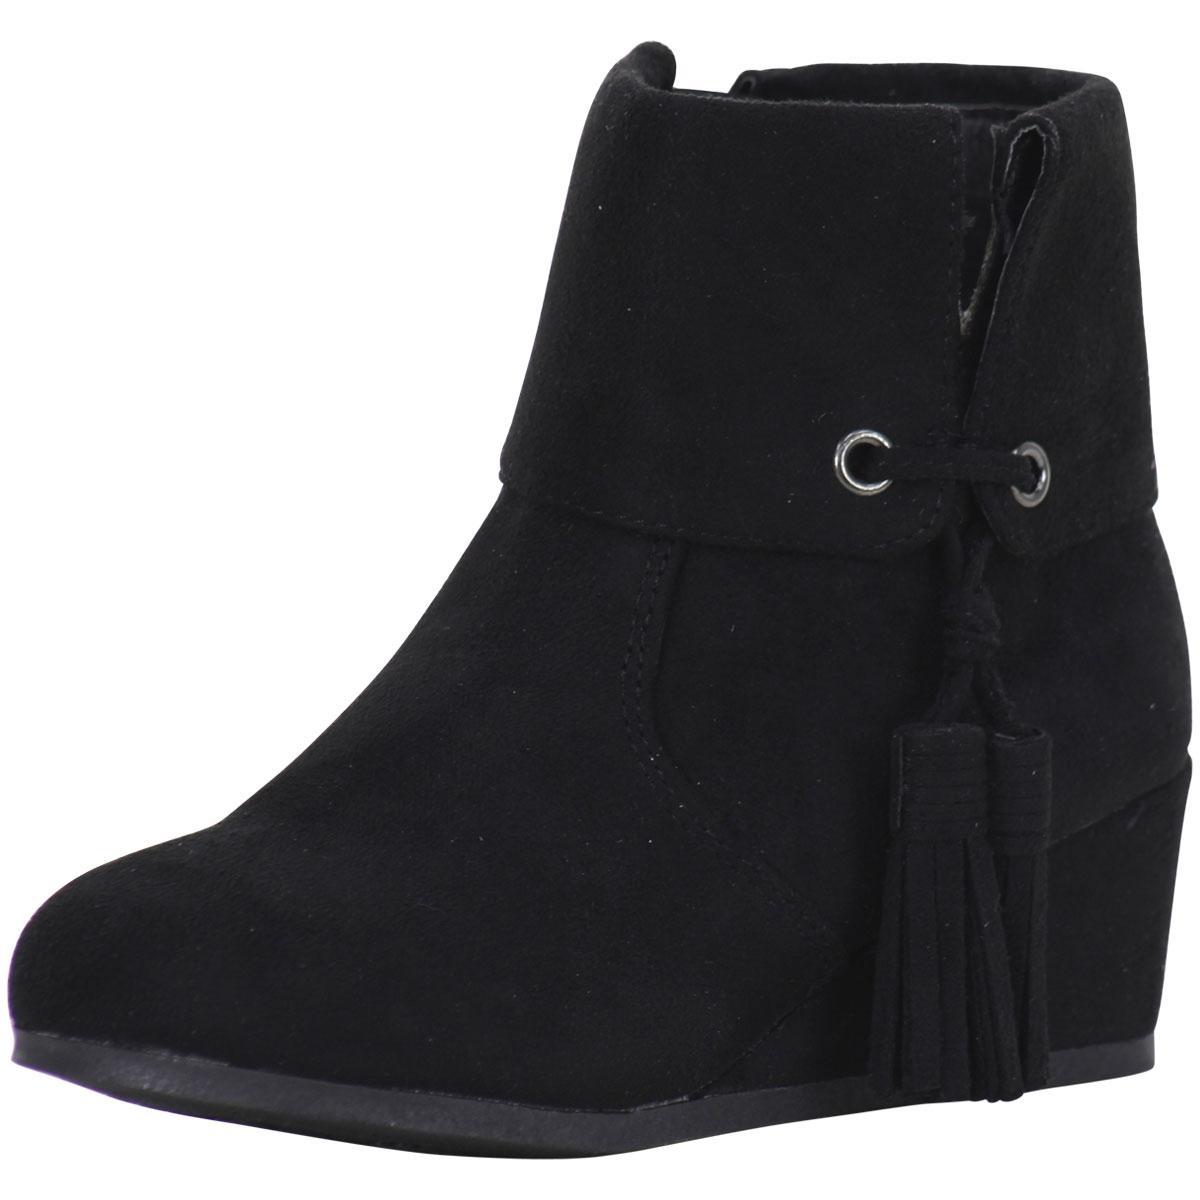 Image of Sugar Little/Big Girl's BonBon Wedge Heel Ankle Boots Shoes - Black - 12 M US Little Kid